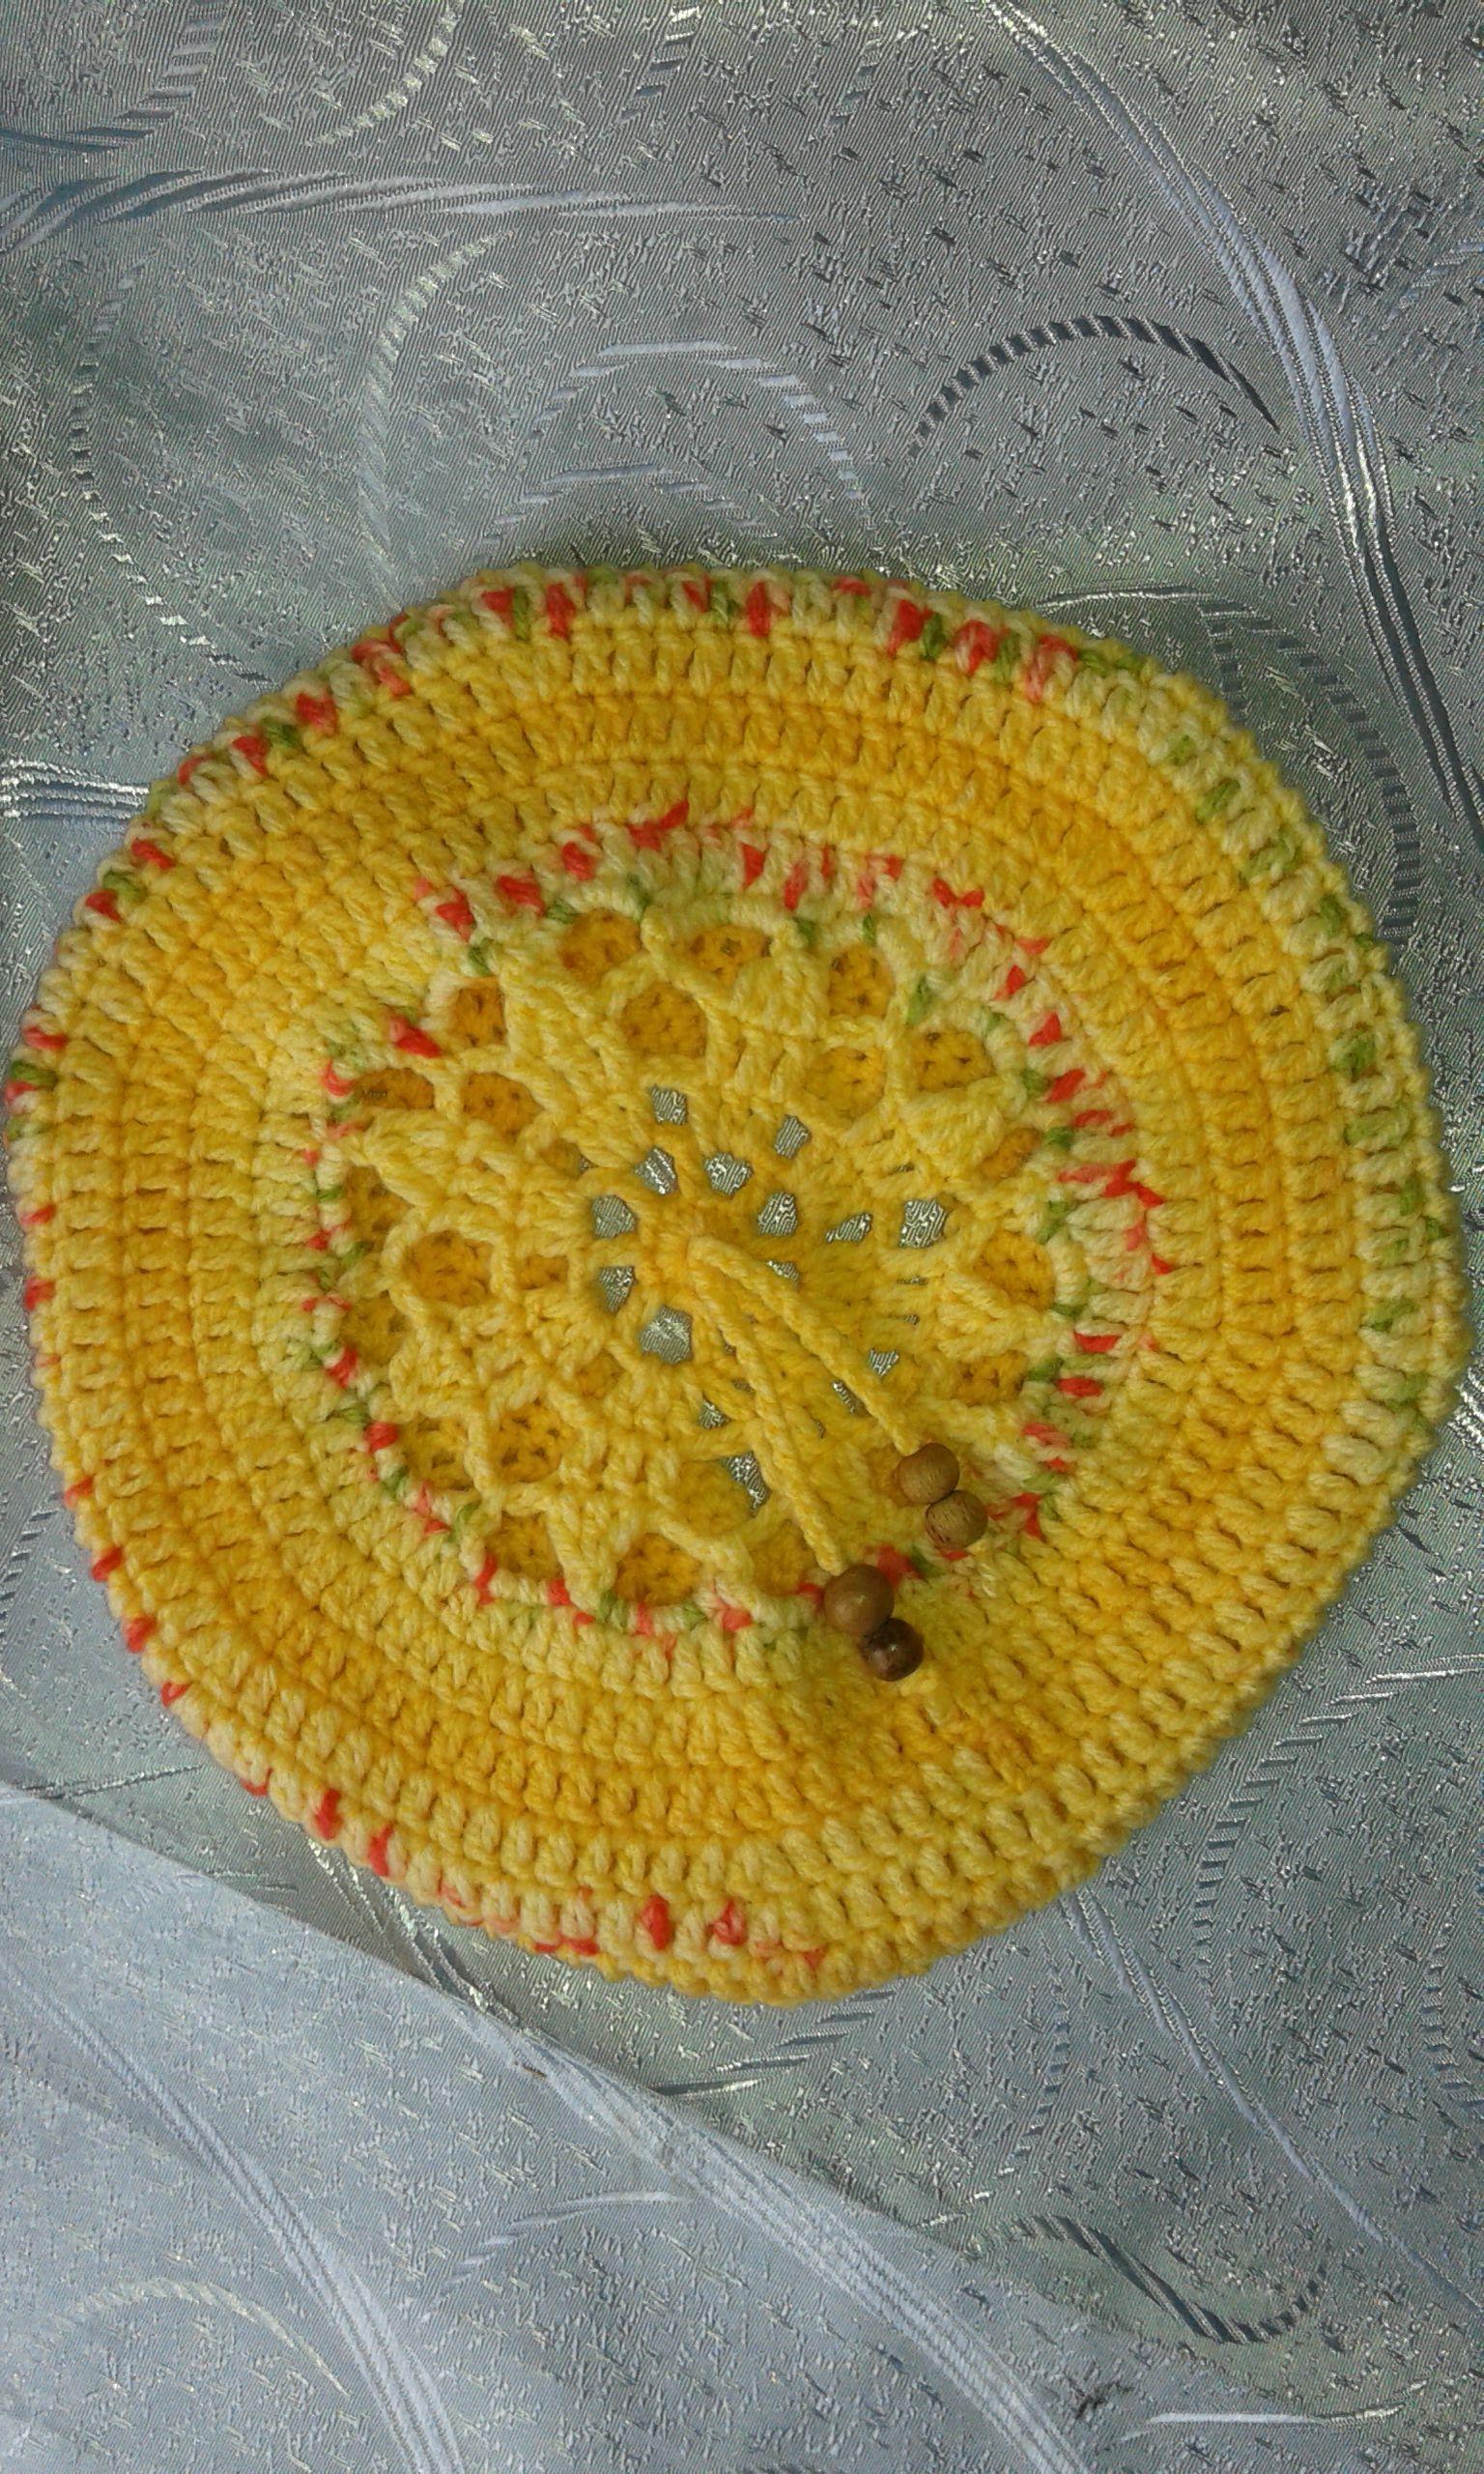 уборы головные берет весна желтый шапка бусины осень дети